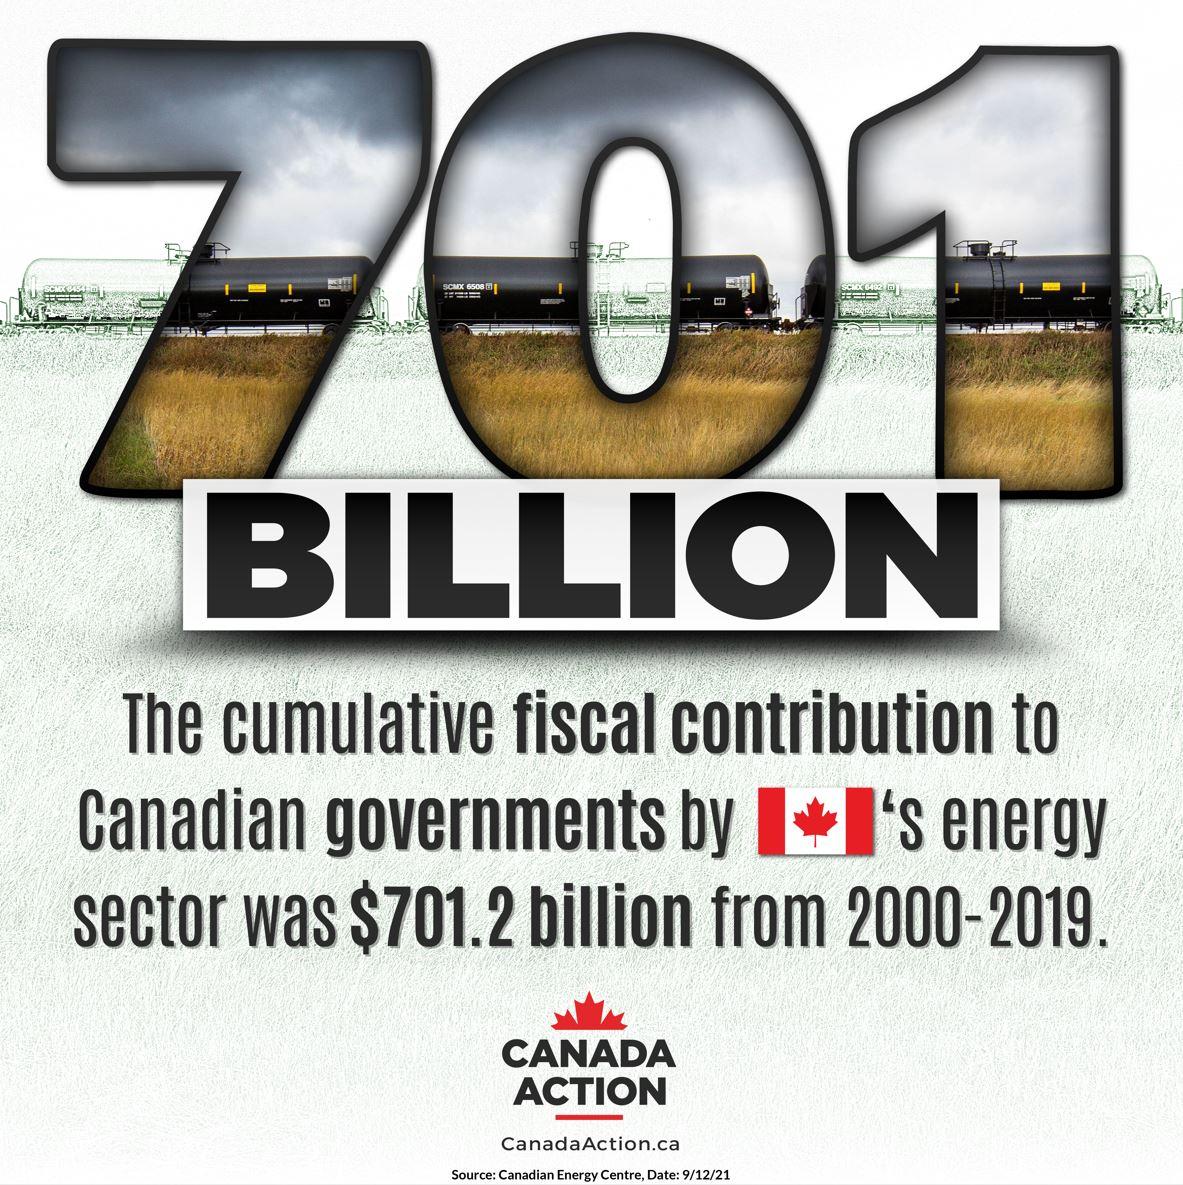 Economic Contribution Oil and Gas Canada 2000-2019